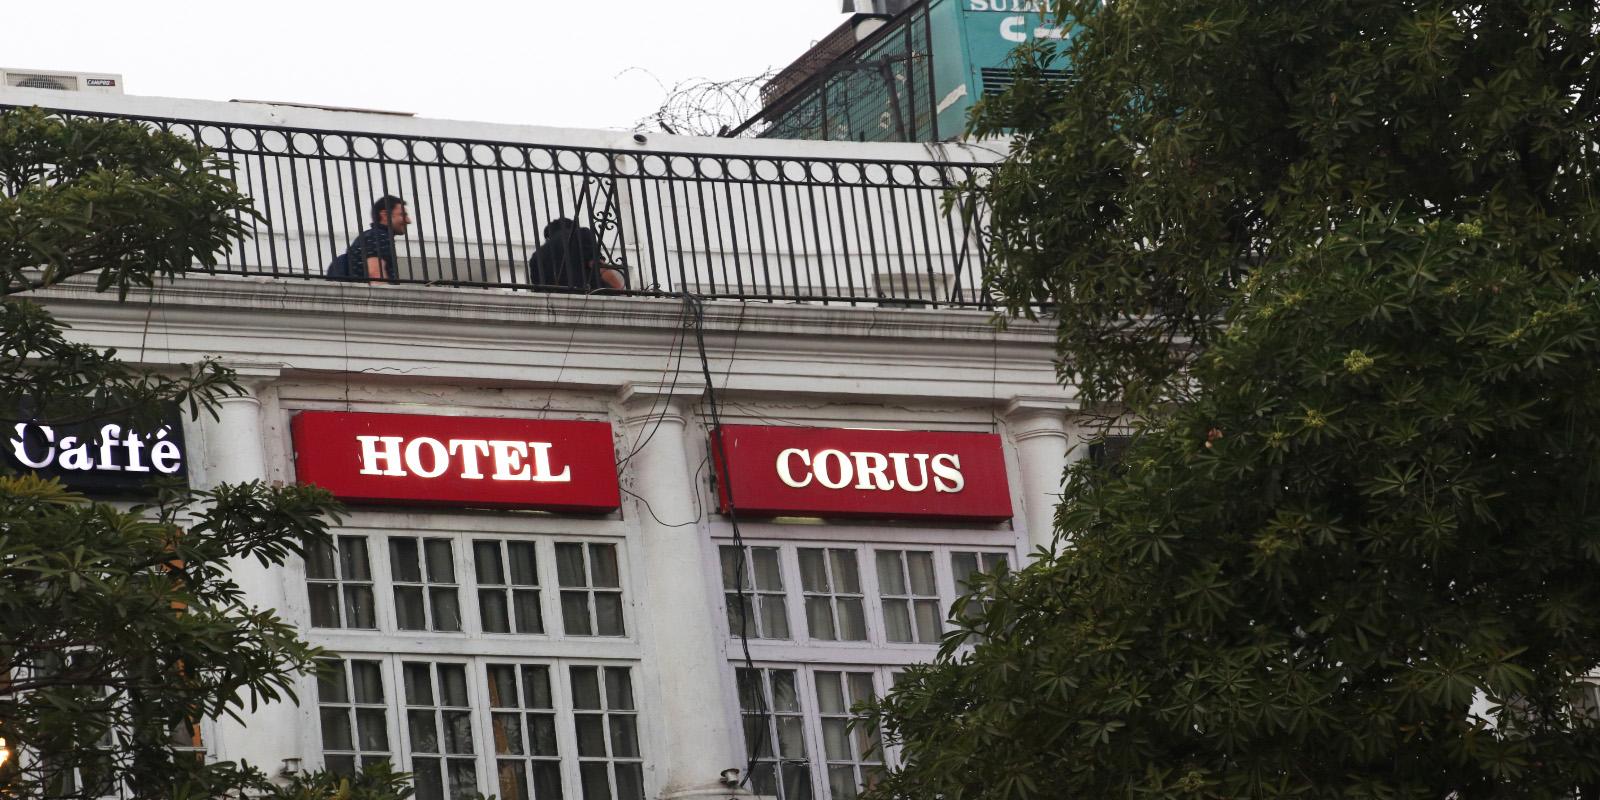 The Corus